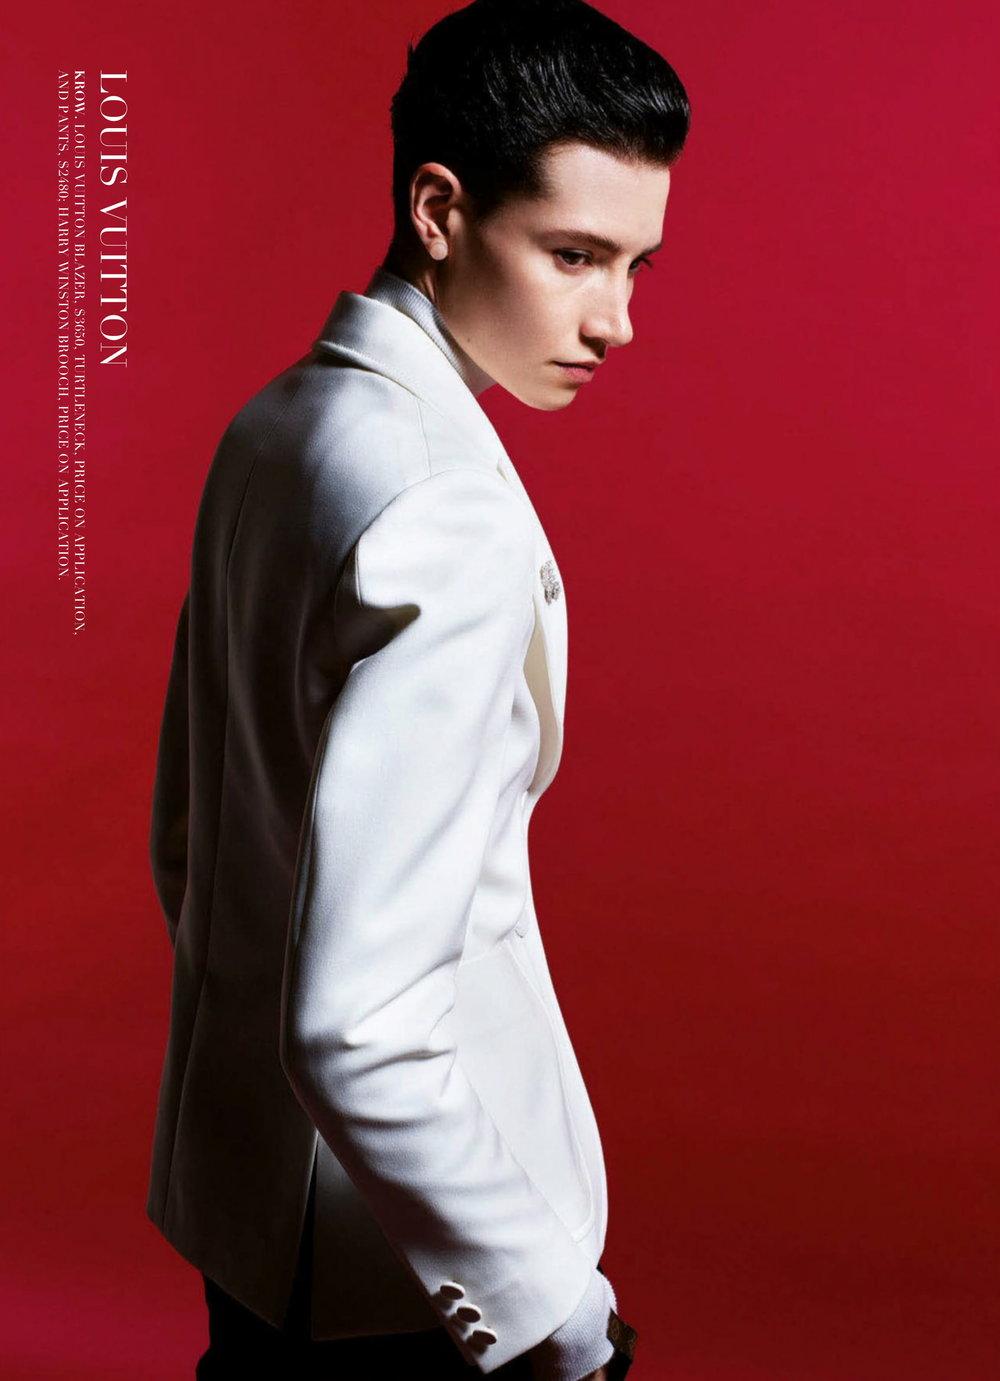 Mario Sorrenti for Harper's Bazaar Australia March 2019 (17).jpg